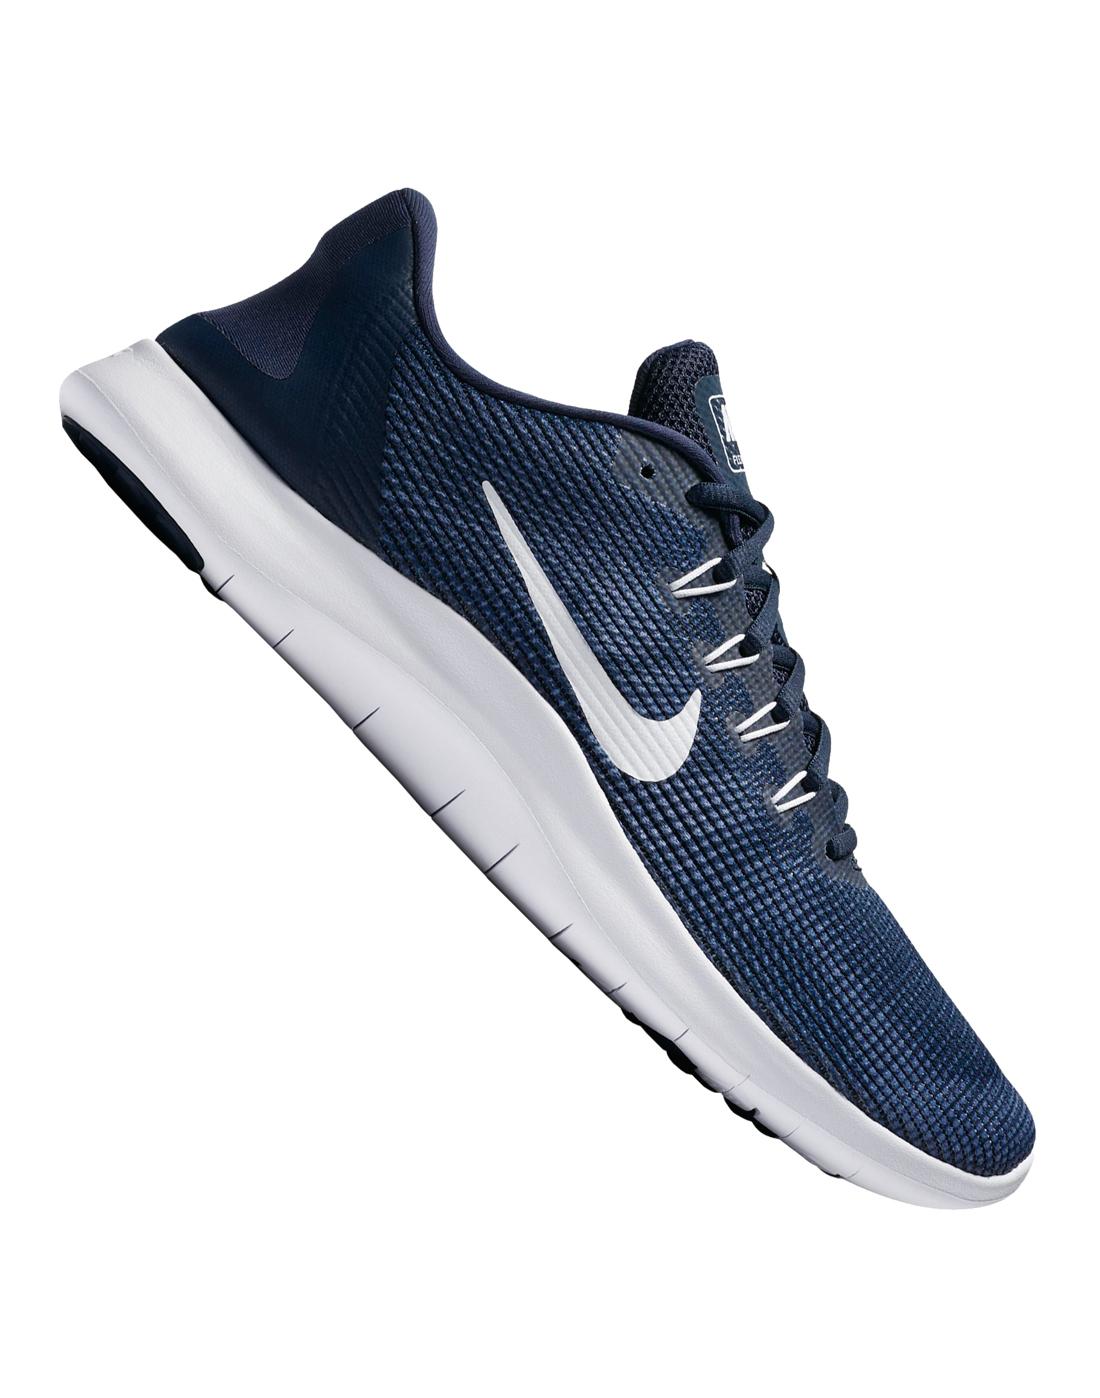 96bfc7b8cb4 Nike Mens Flex 2018 RN